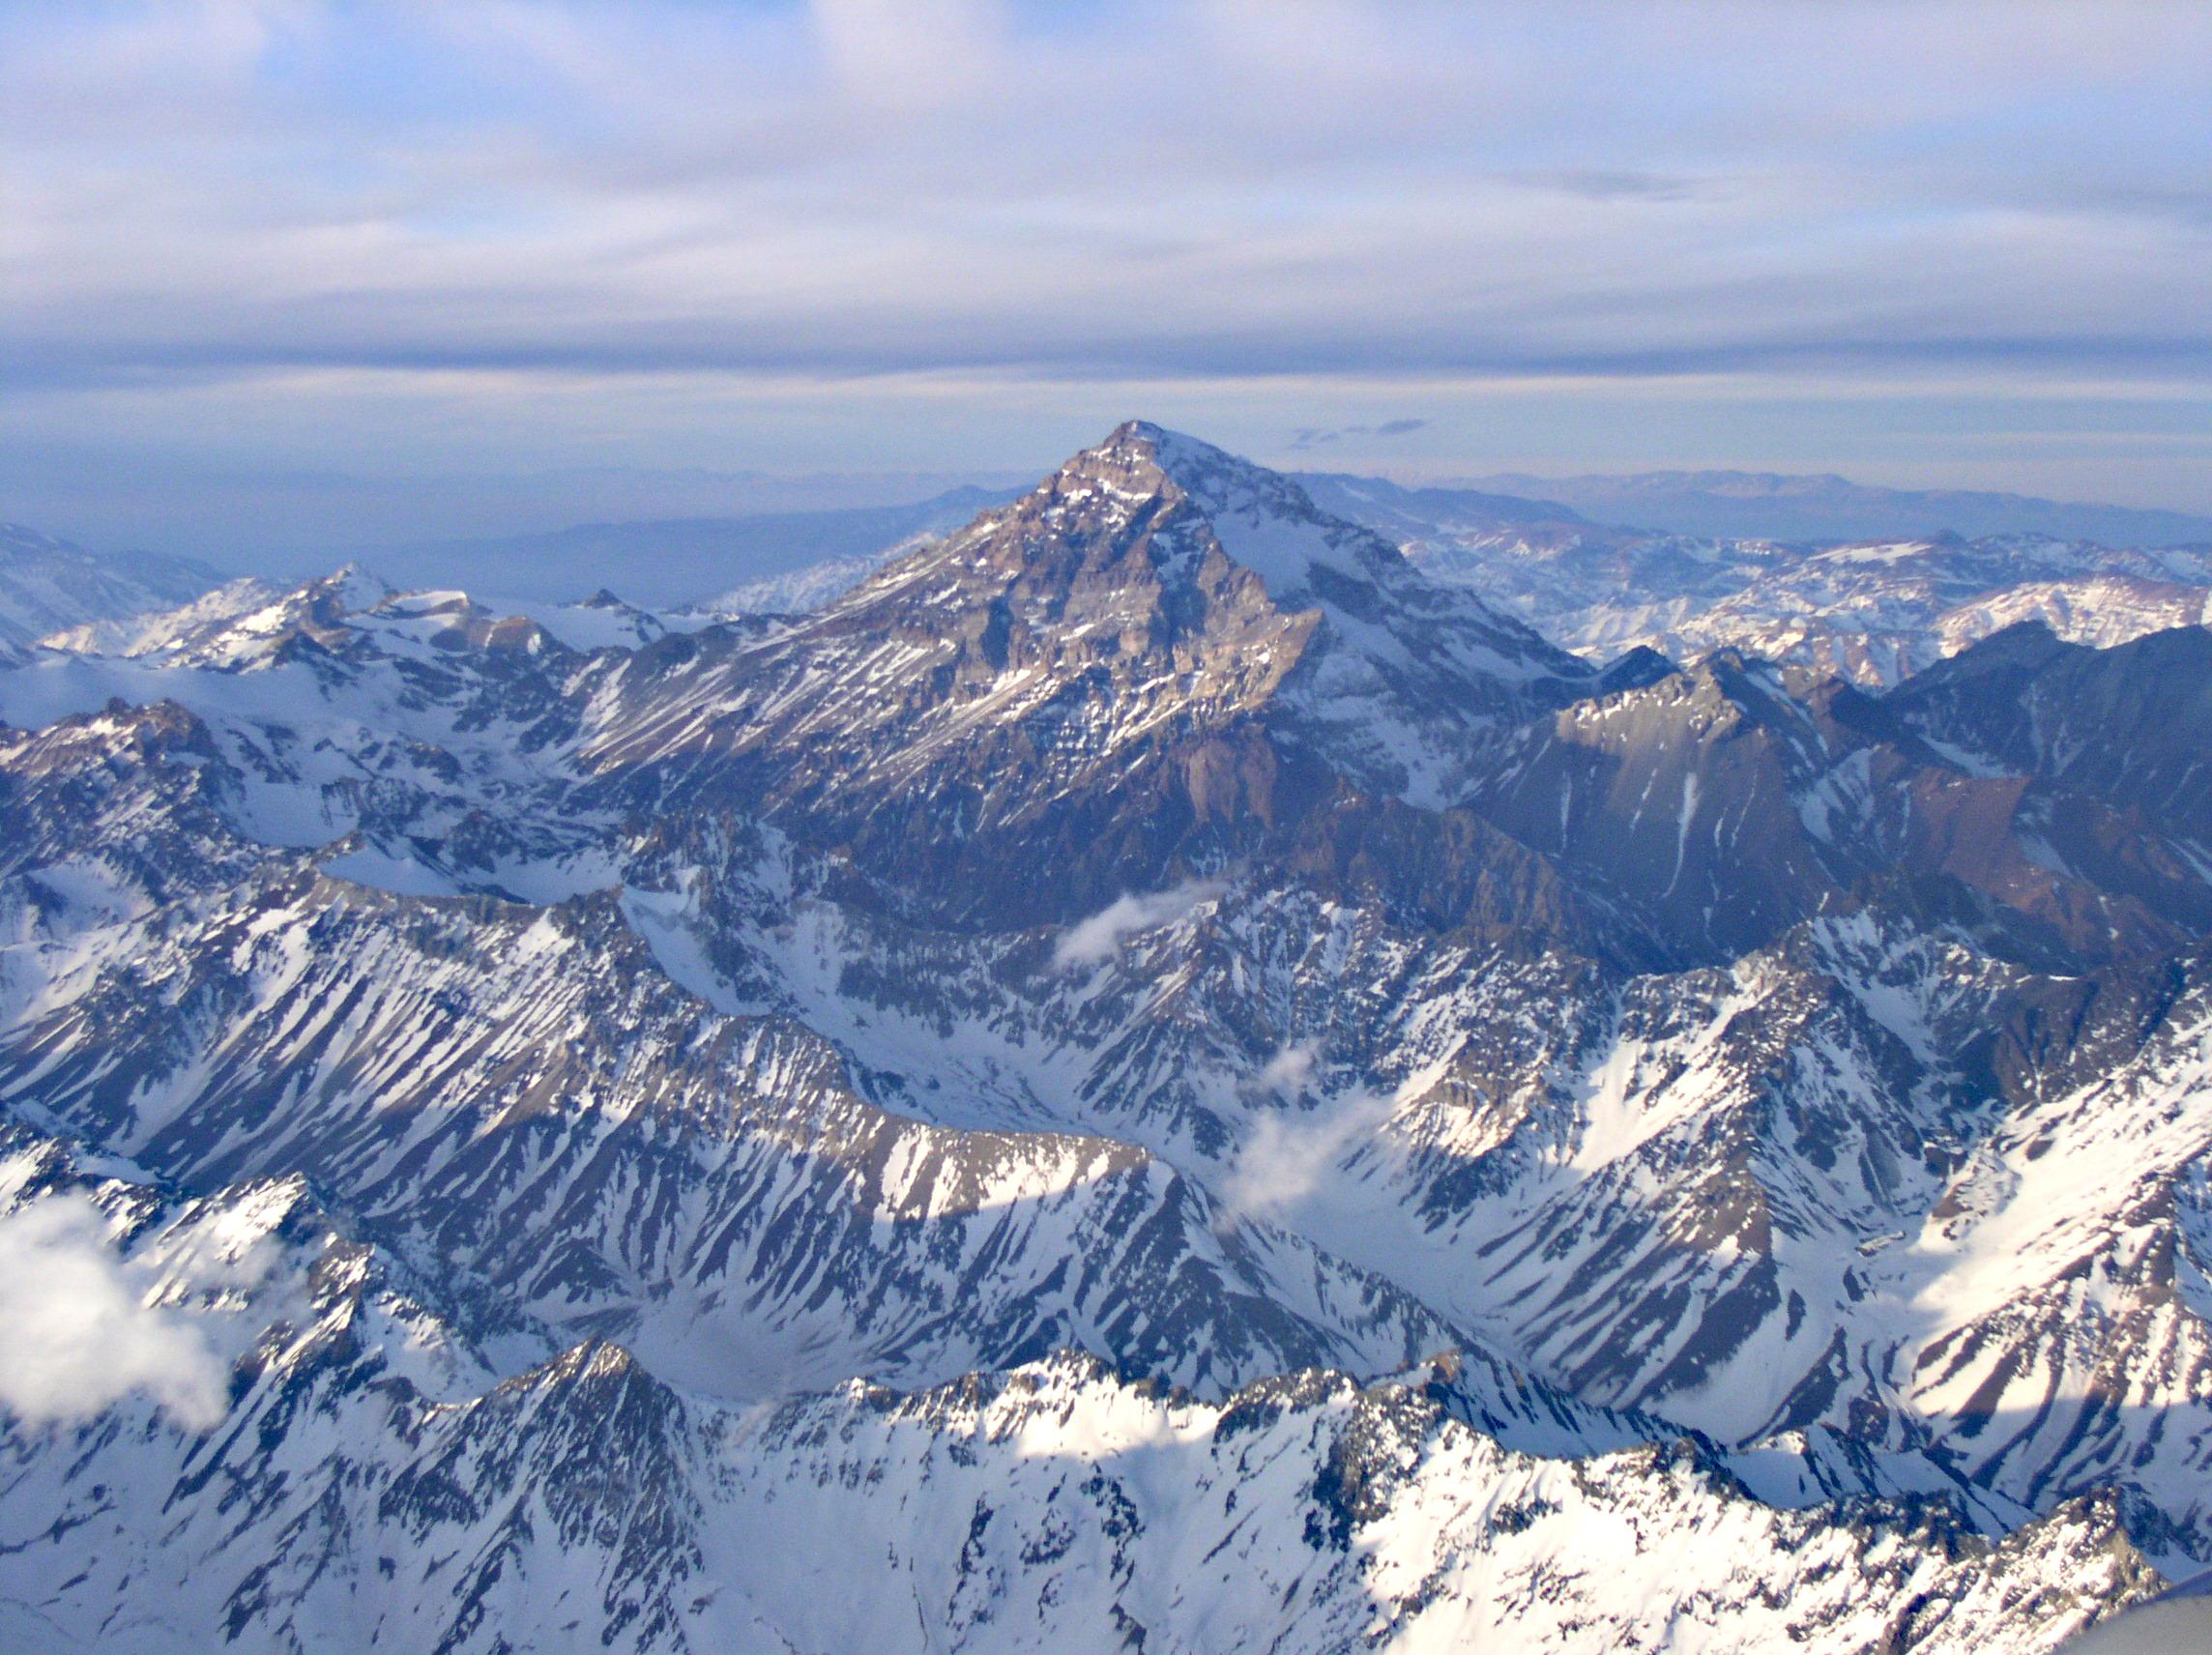 File:Aconcagua (aerial).jpg